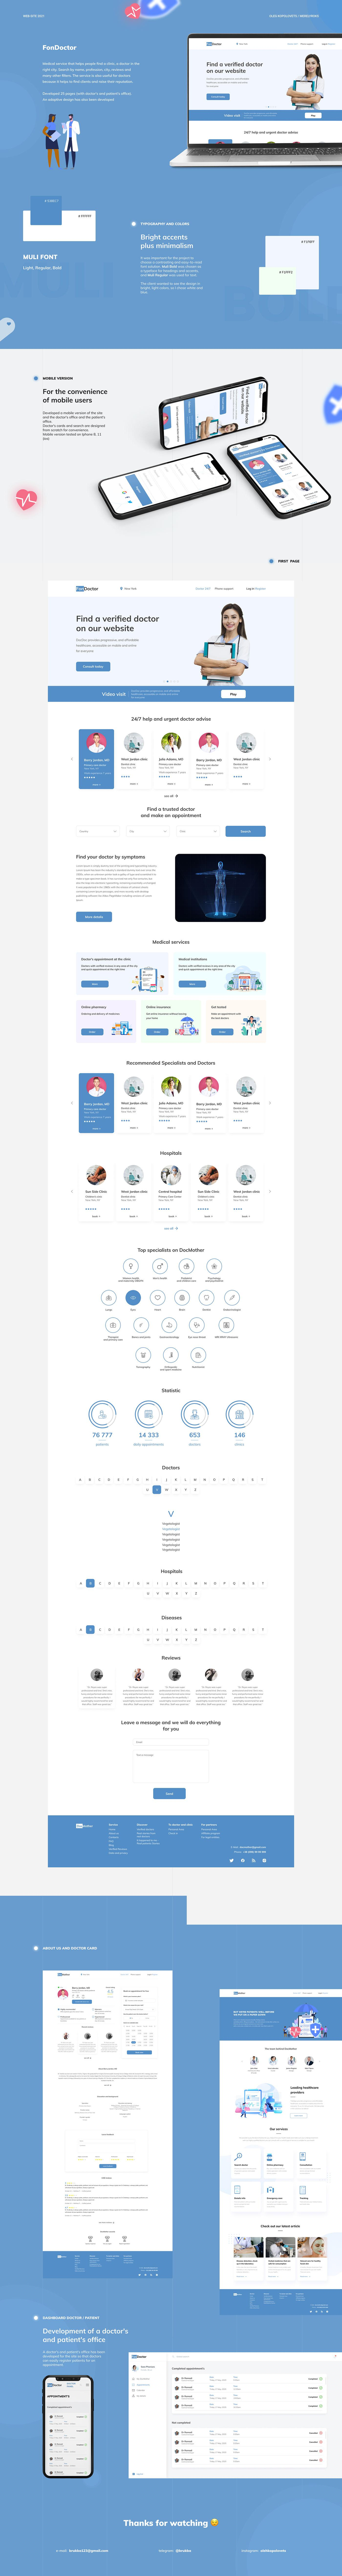 medical medical design Medical services ui design UI/UX Design Web-site дизайн лендинг